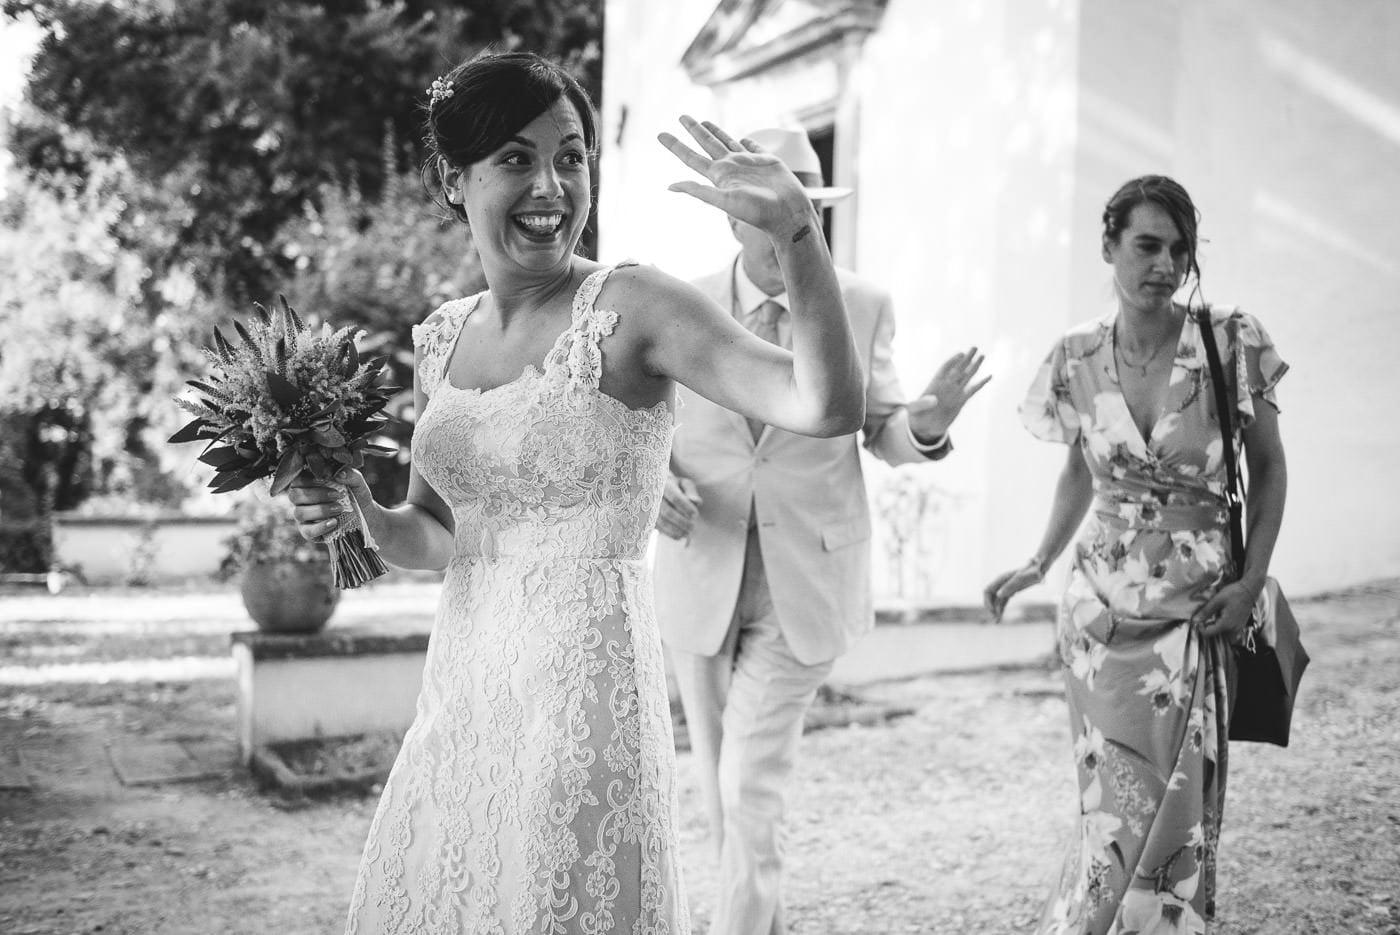 Matrimonio Giulia & Federico 09_15 – Alessio Nobili Photographer-23